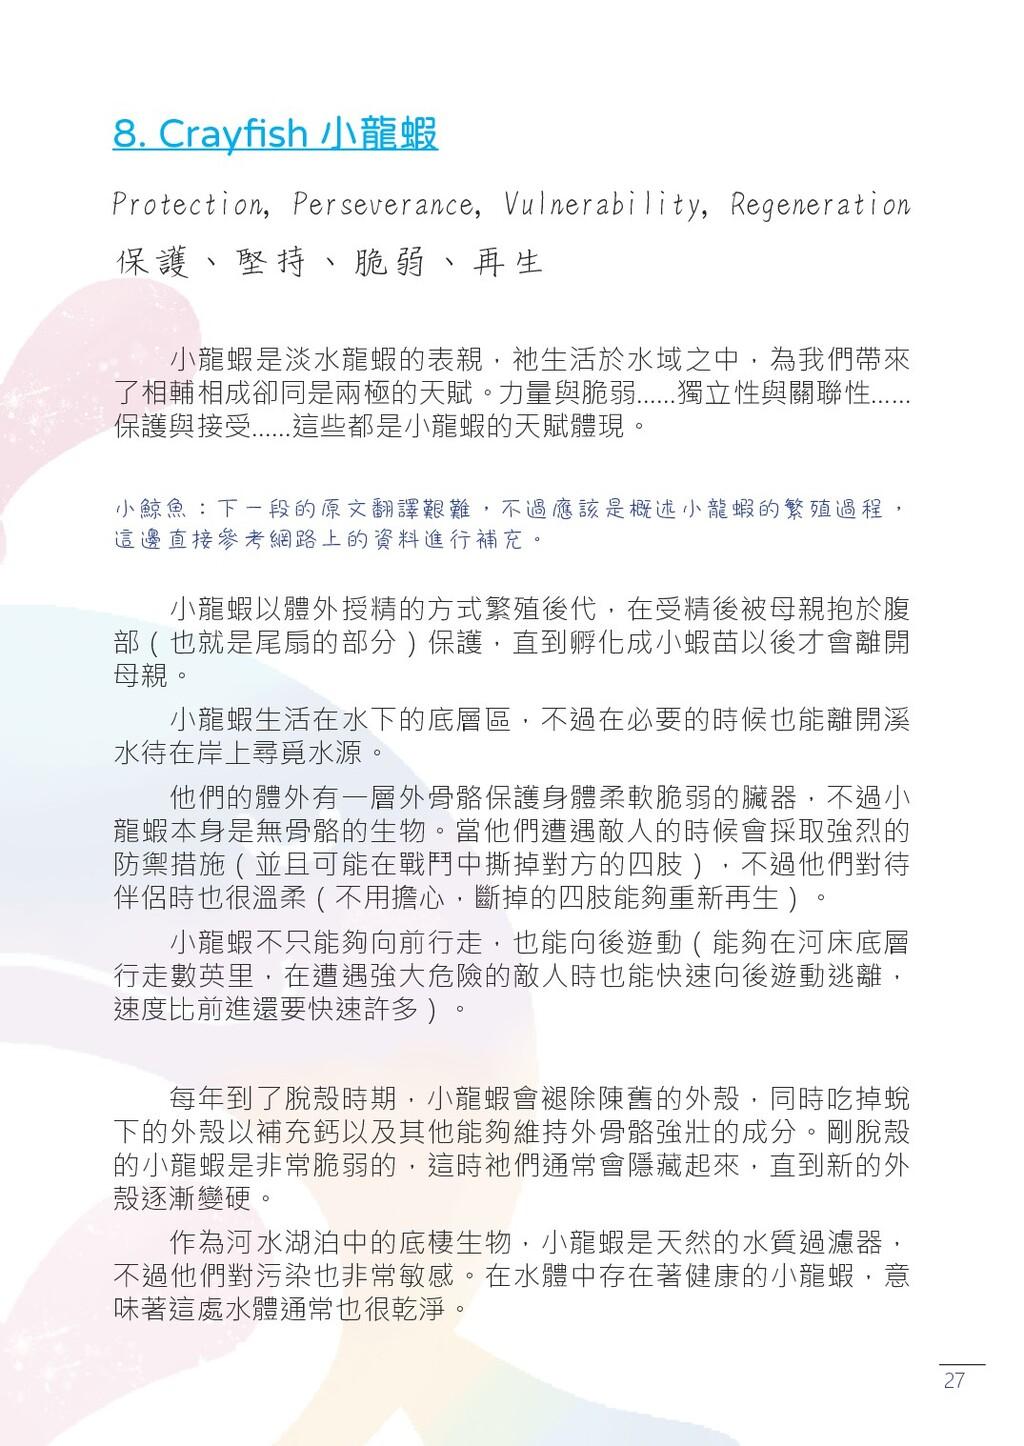 27 8. Crayfish 小龍蝦 Protection, Perseverance, Vu...